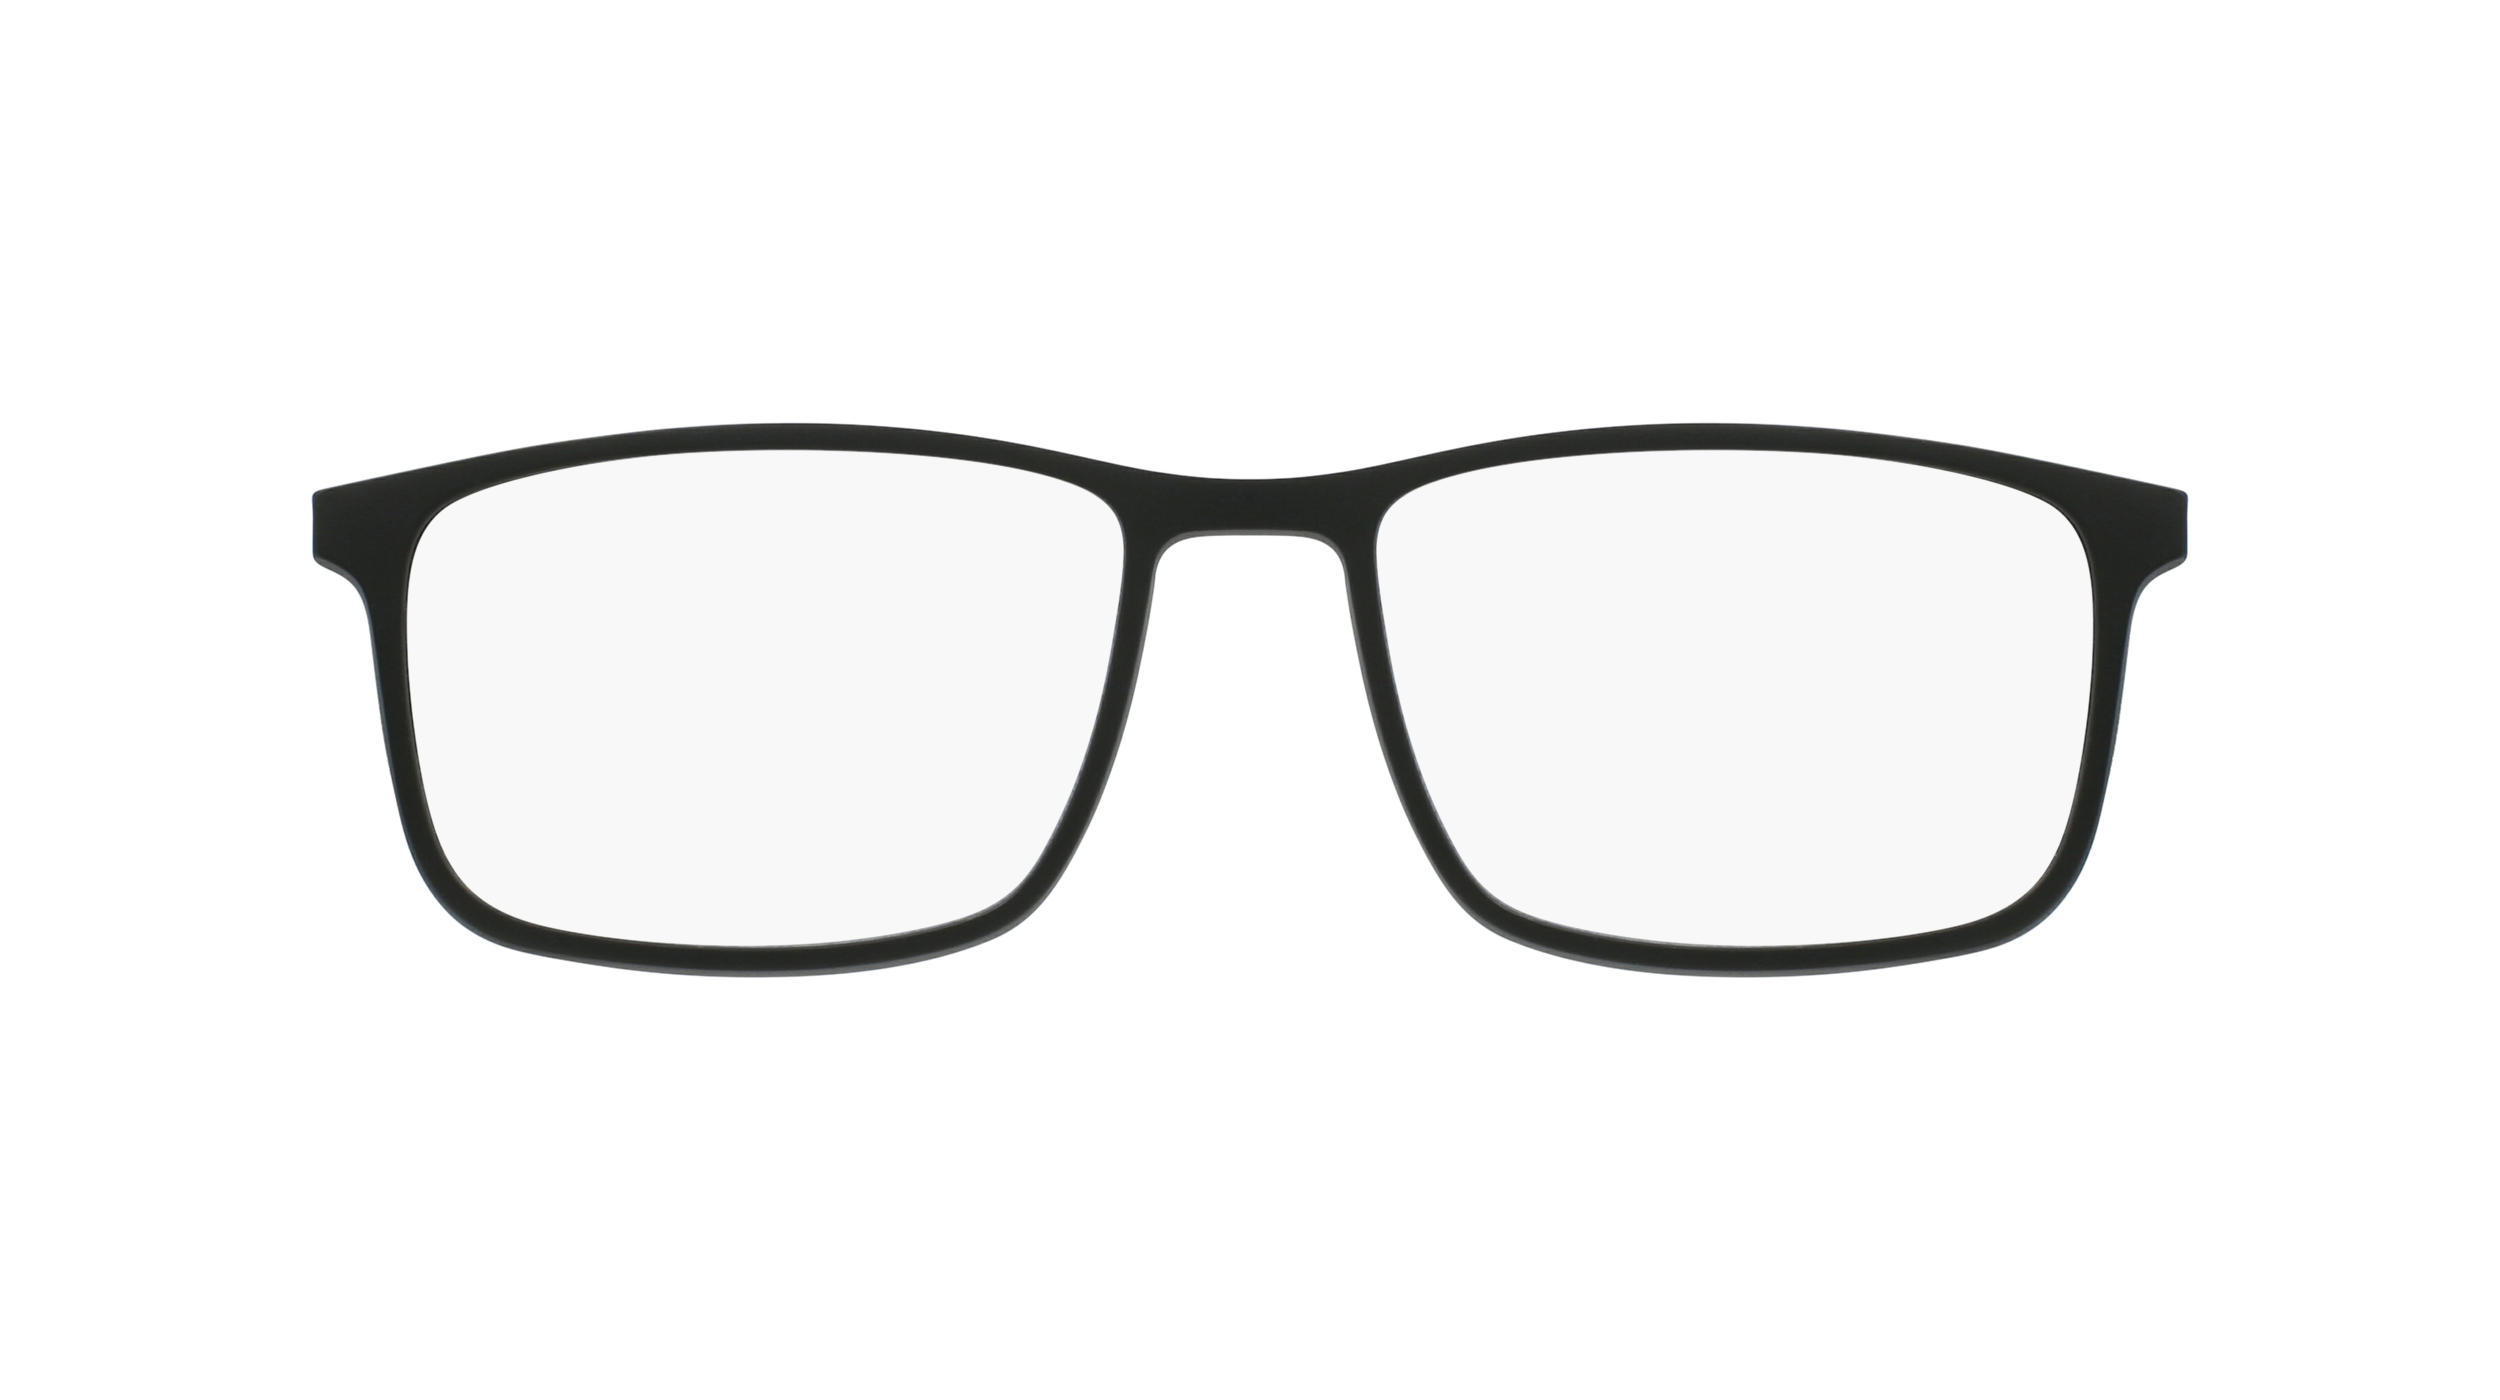 afflelou/france/products/smart_clip/clips_glasses/07630036458648.png